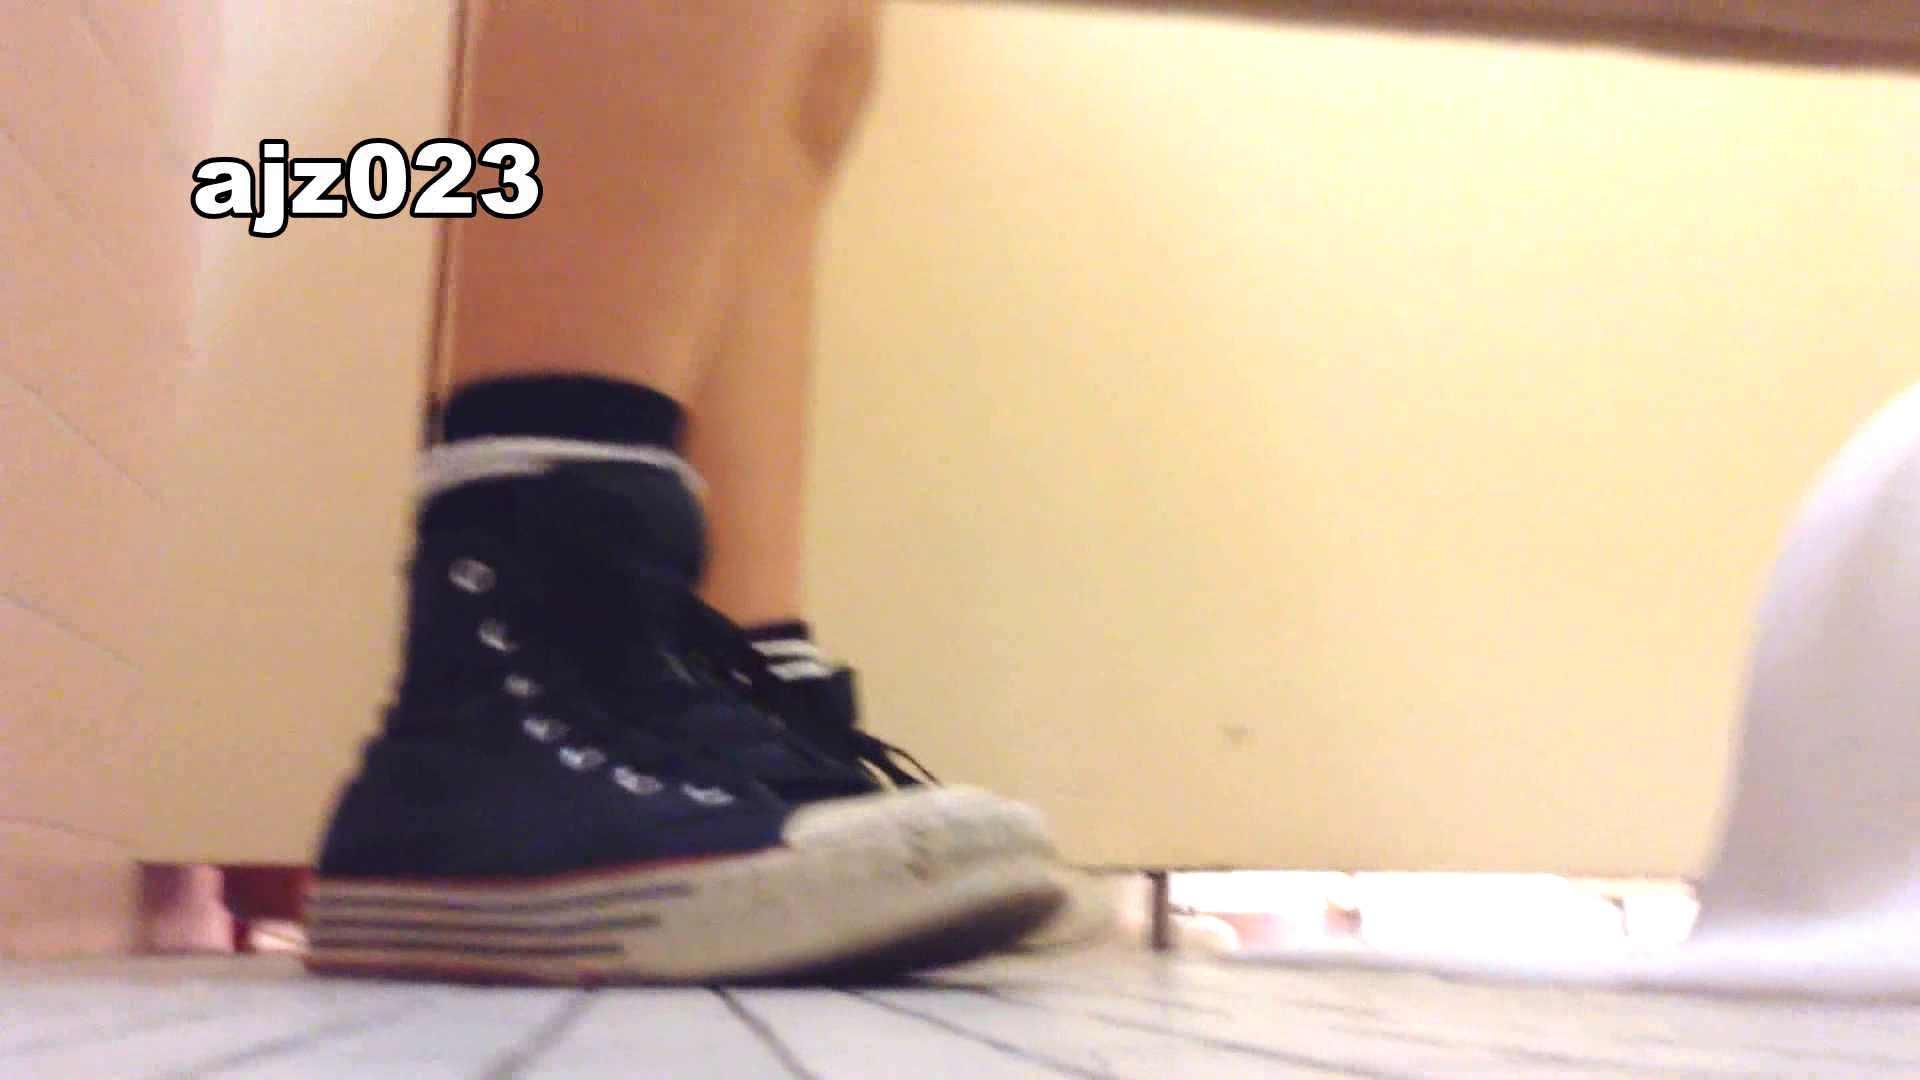 某有名大学女性洗面所 vol.23 洗面所 隠し撮りオマンコ動画紹介 101画像 67